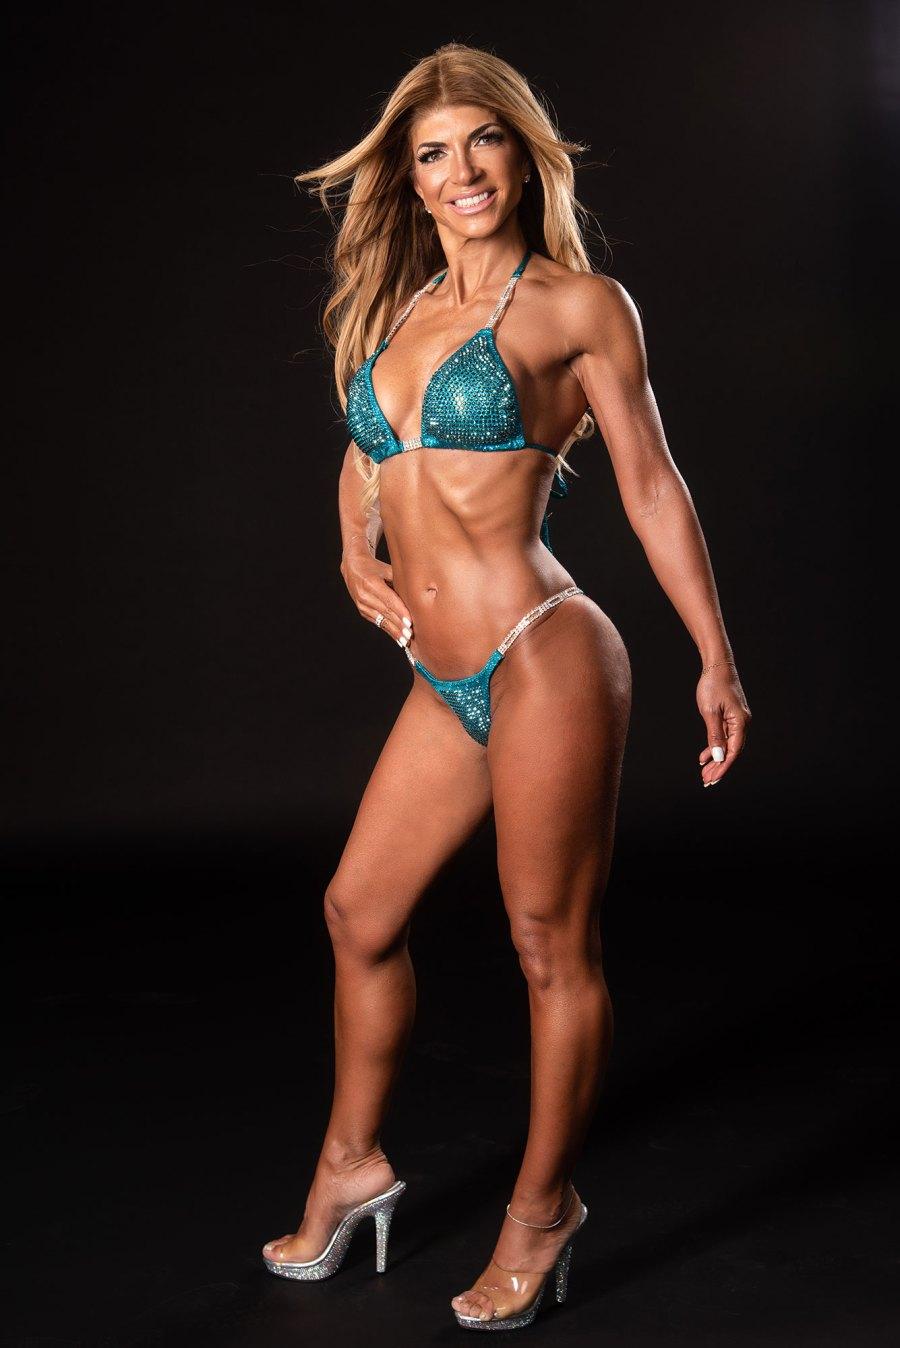 best bodies over 40 Teresa Giudice